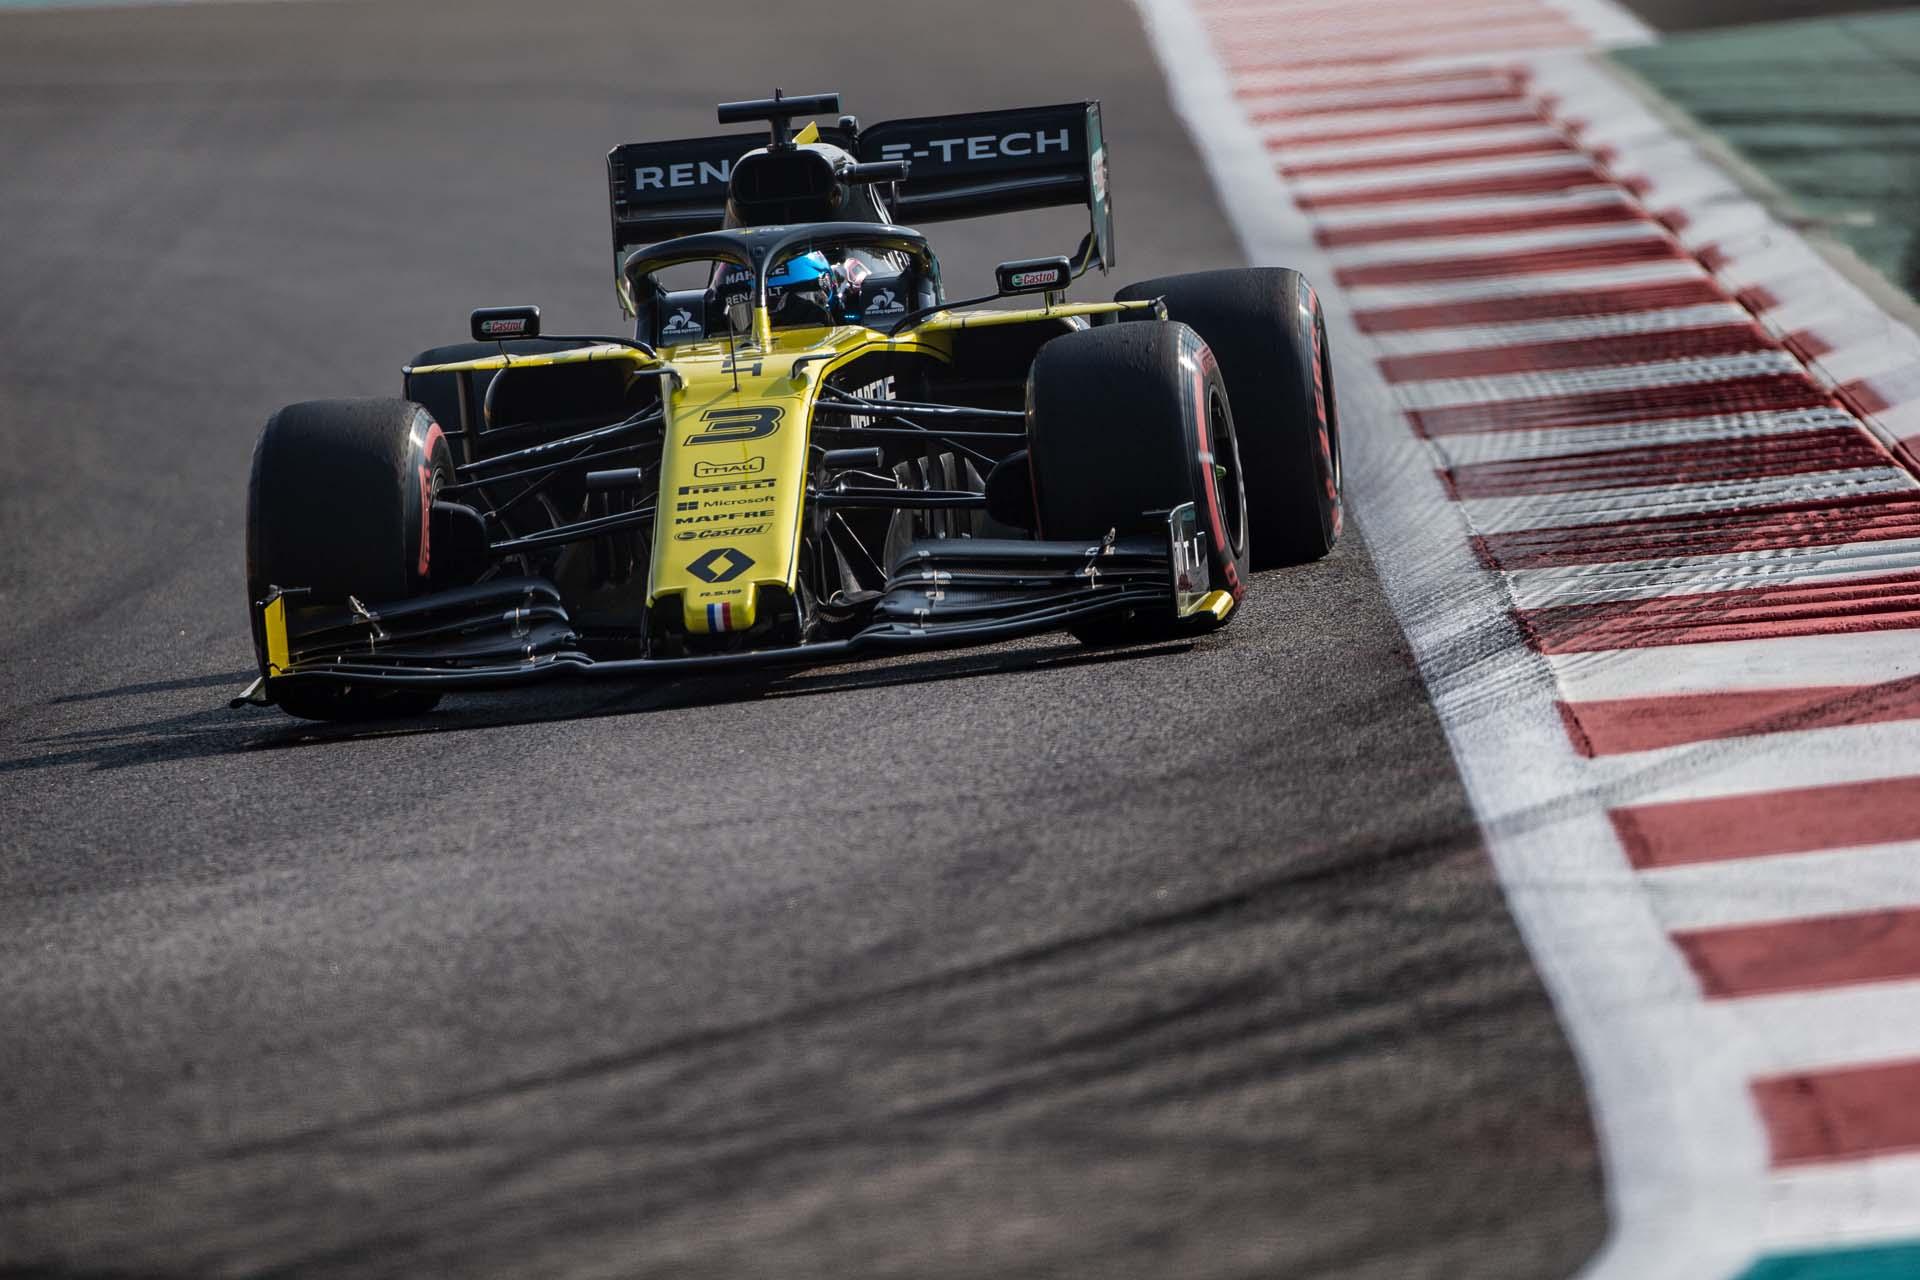 Motor Racing - Formula One World Championship - Abu Dhabi Grand Prix - Qualifying Day - Abu Dhabi, UAE